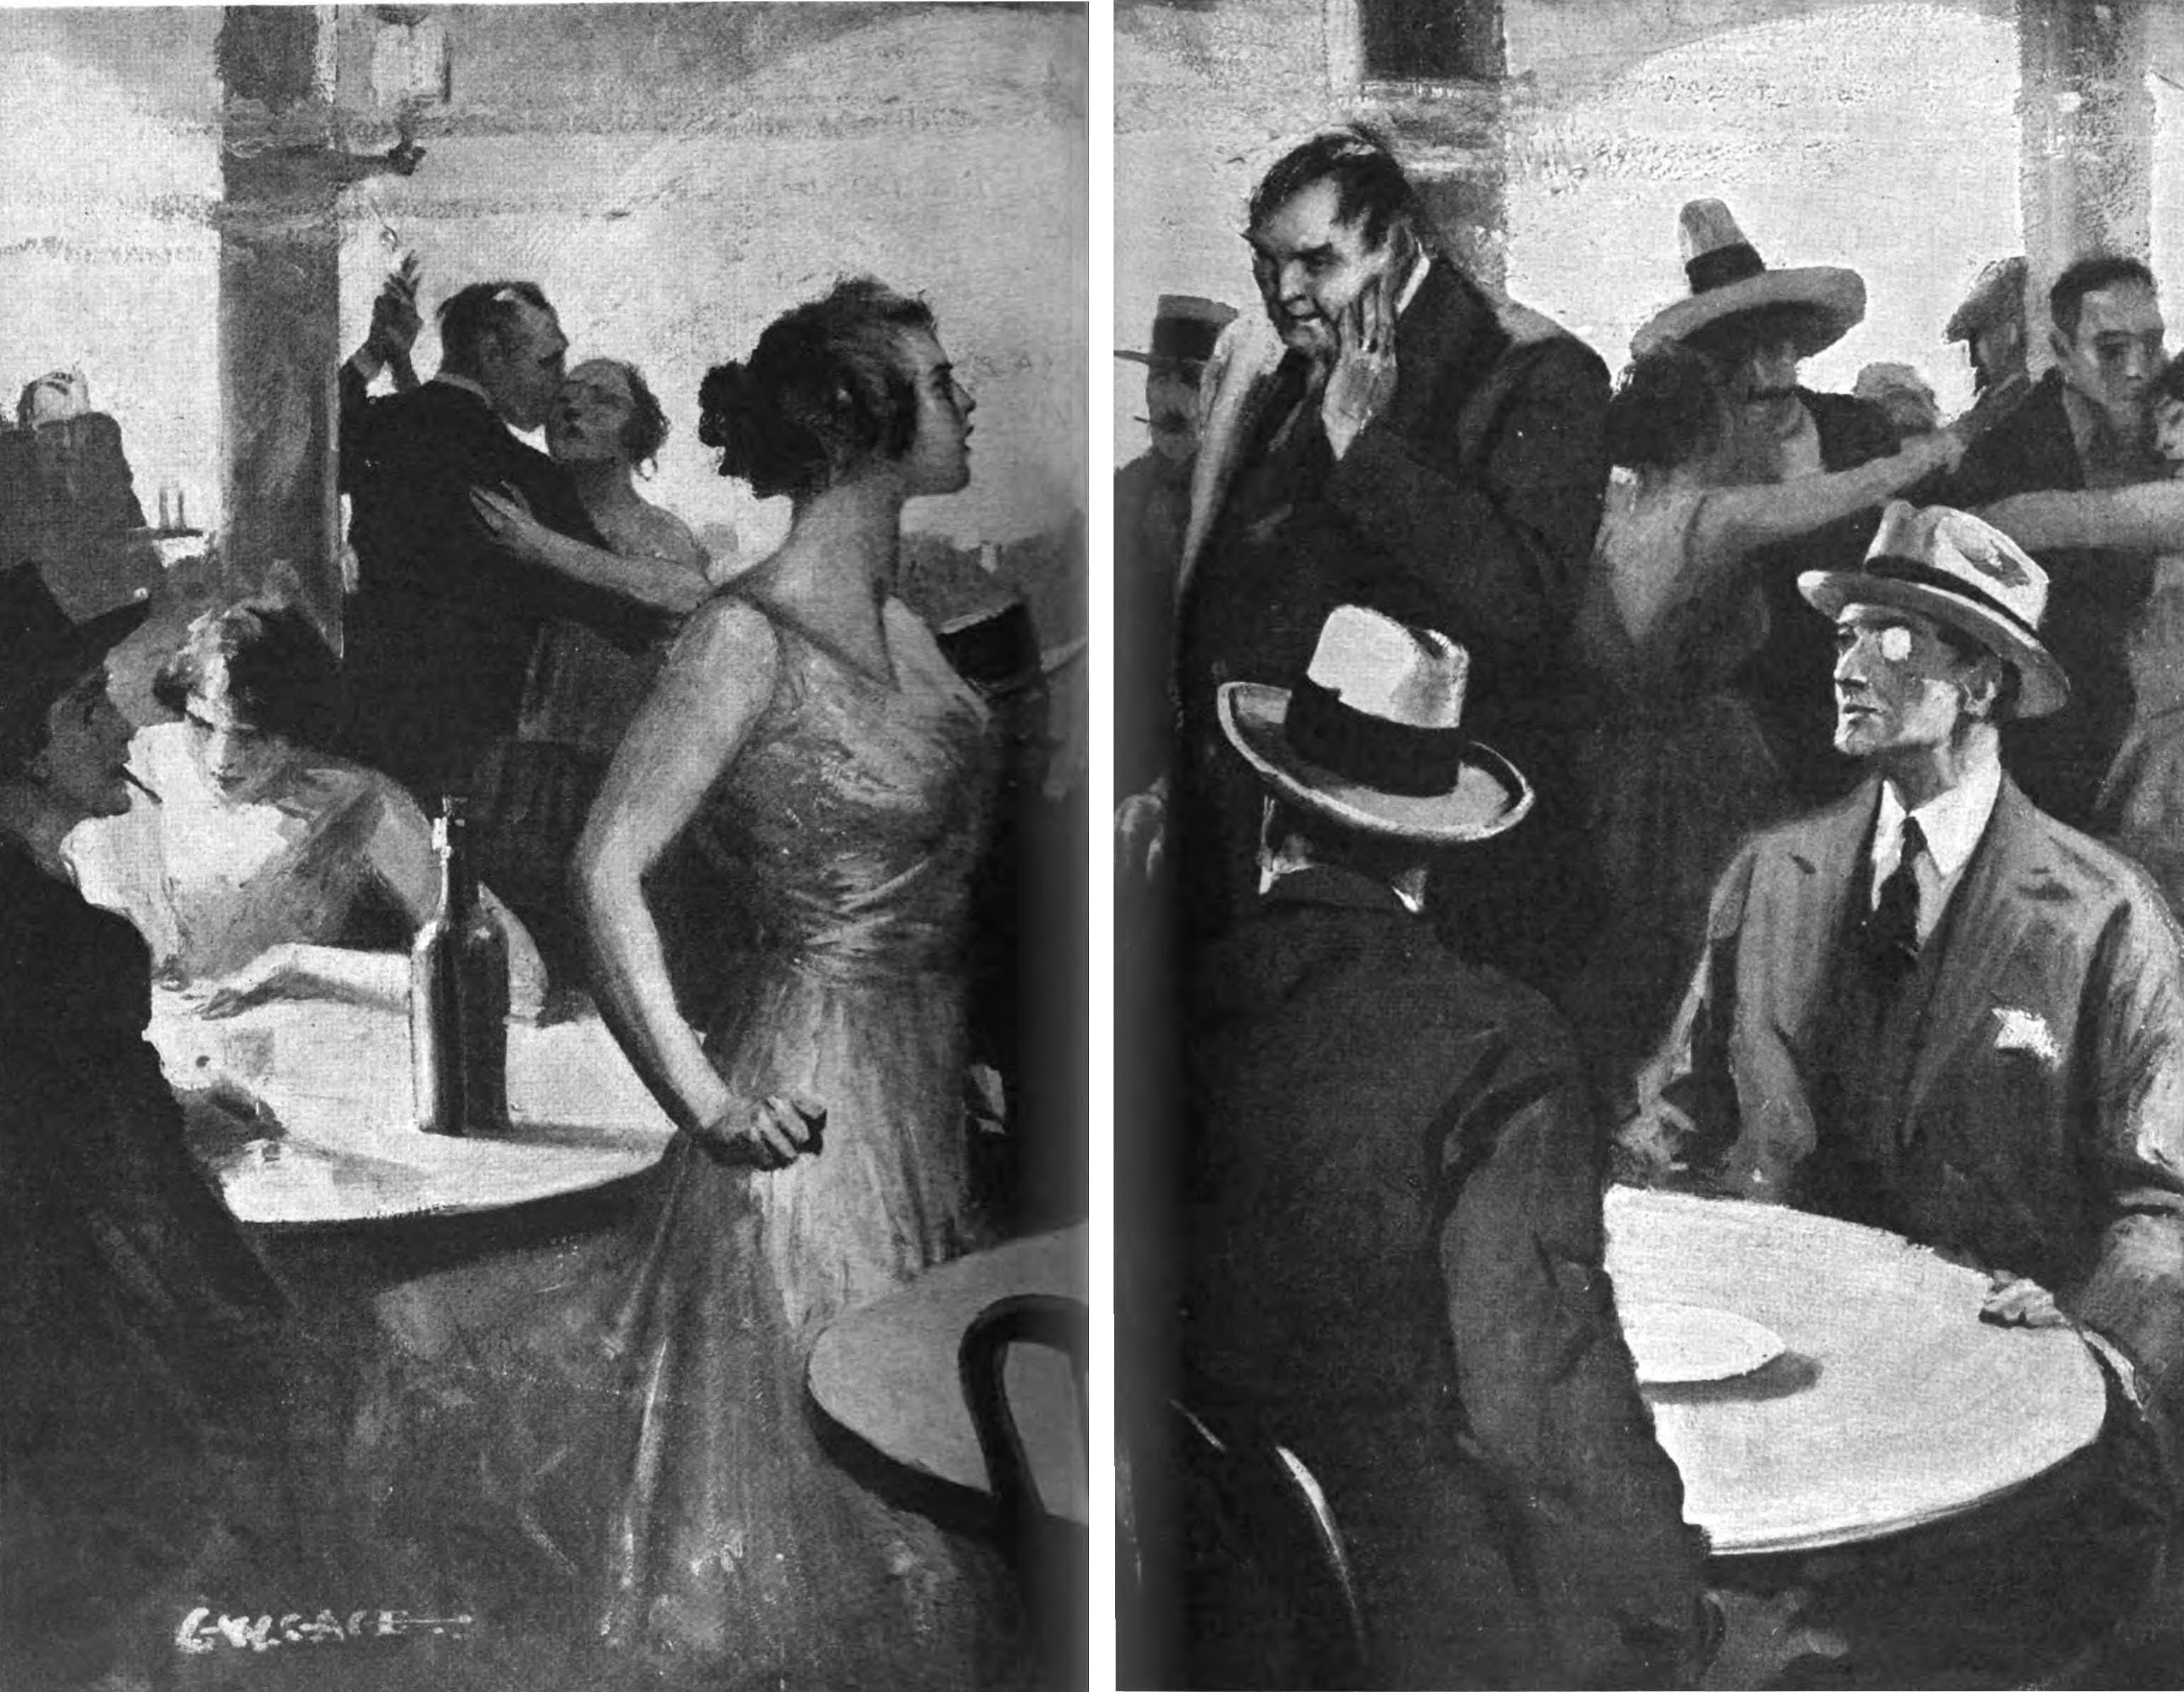 Illustration for the Jim Maitland story Colette